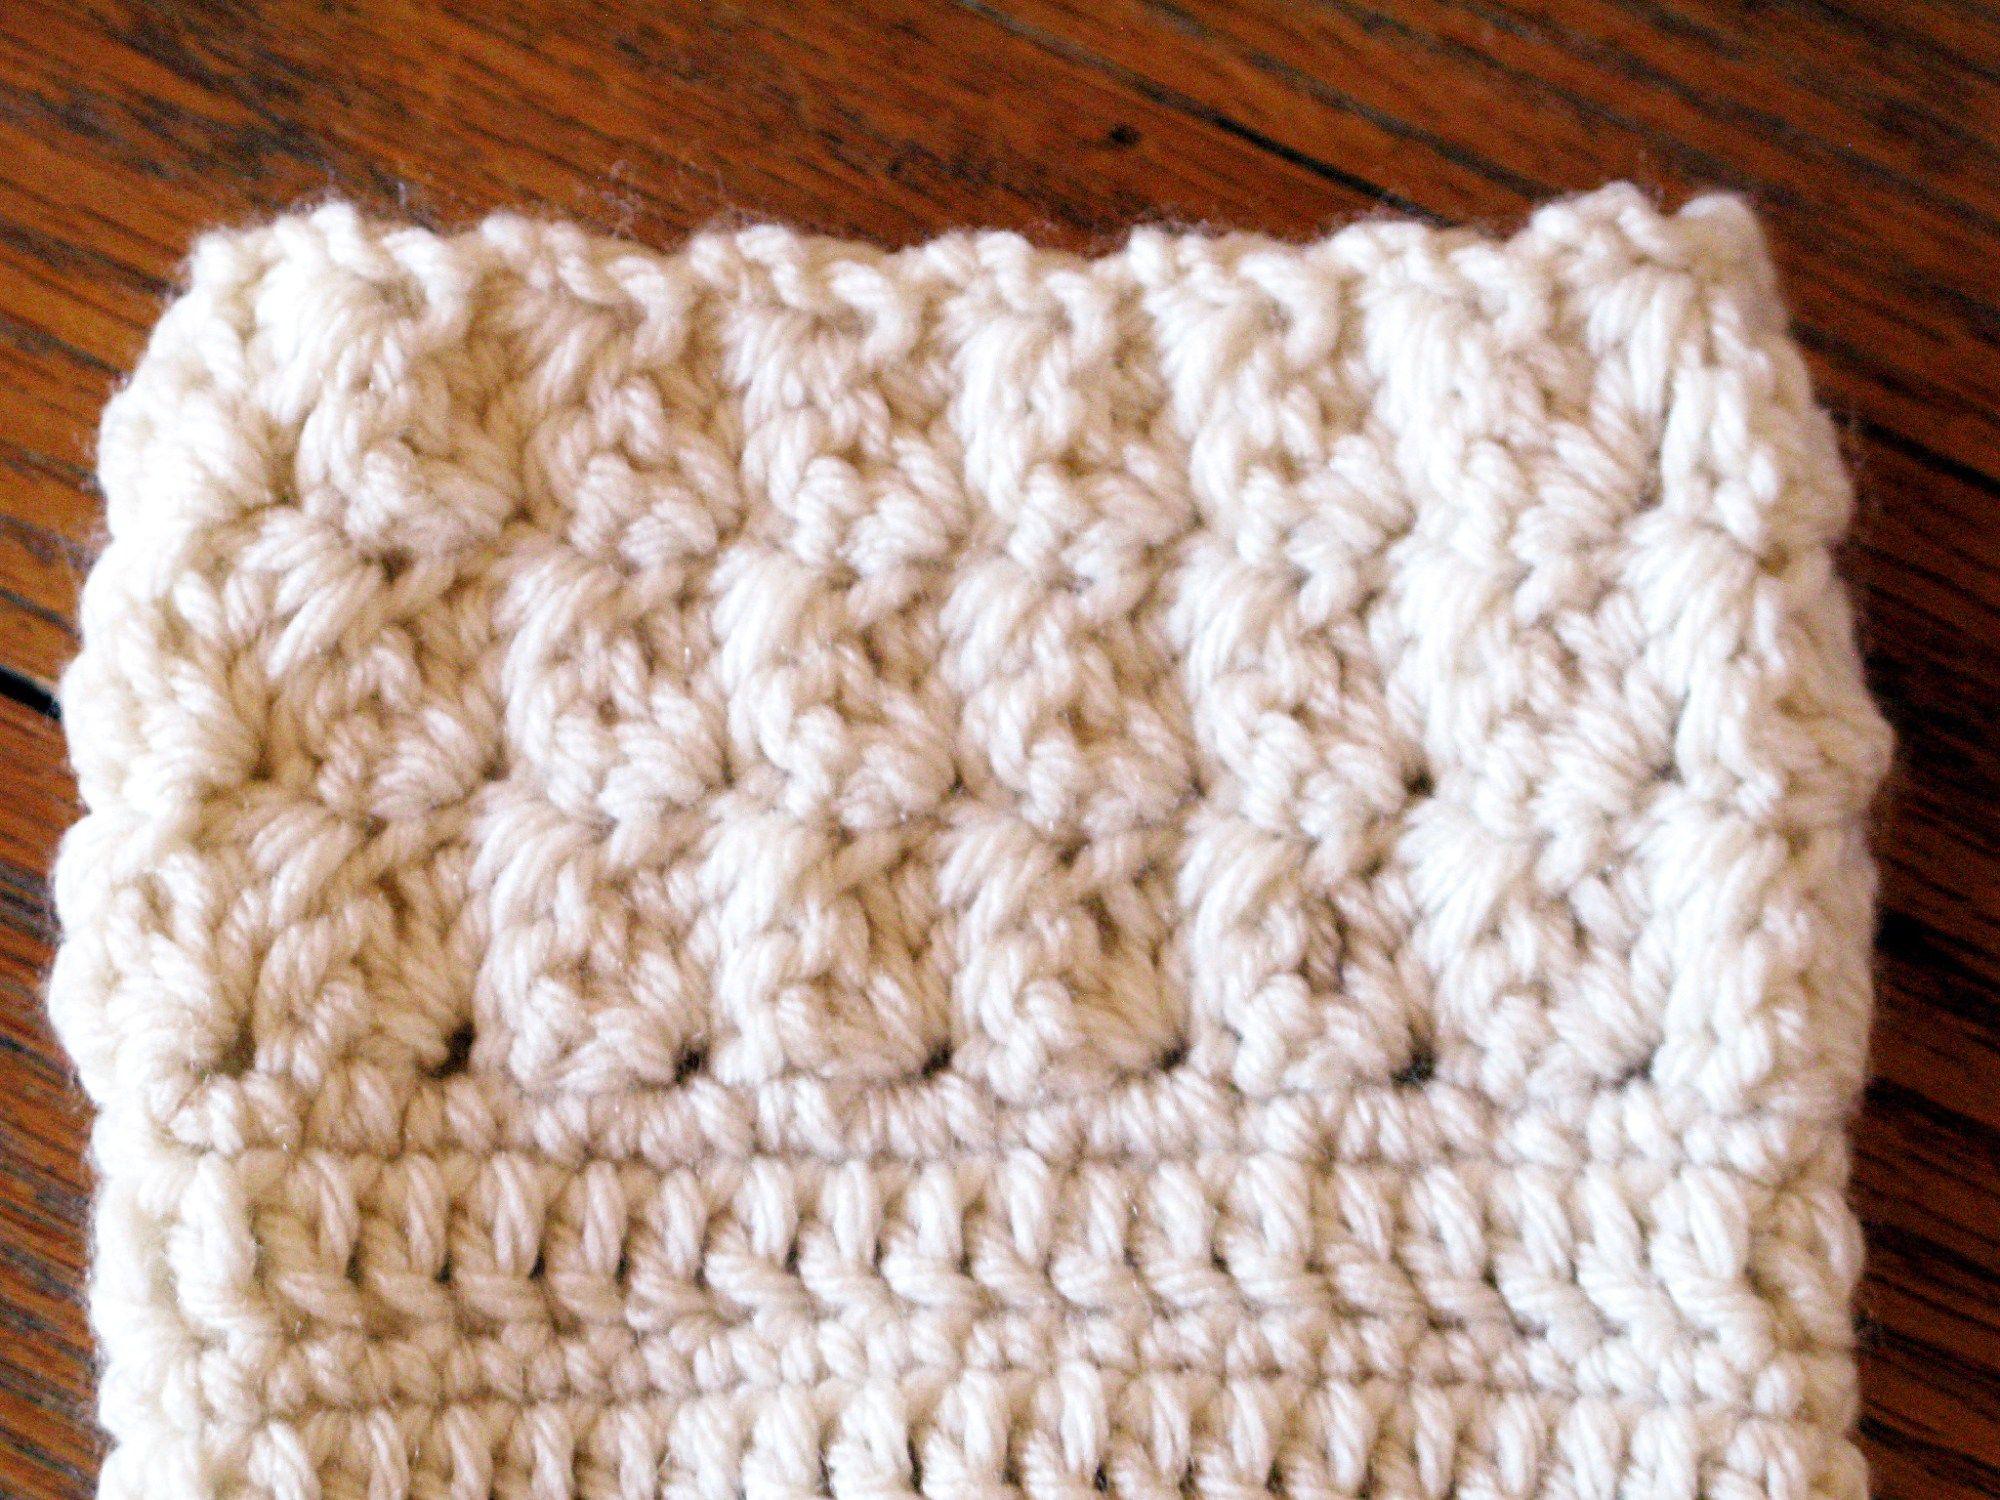 Ripple stitch boot cuff pattern by elk studio crochet boot how to crochet ripple stitch free crochet boot cuff pattern bankloansurffo Images